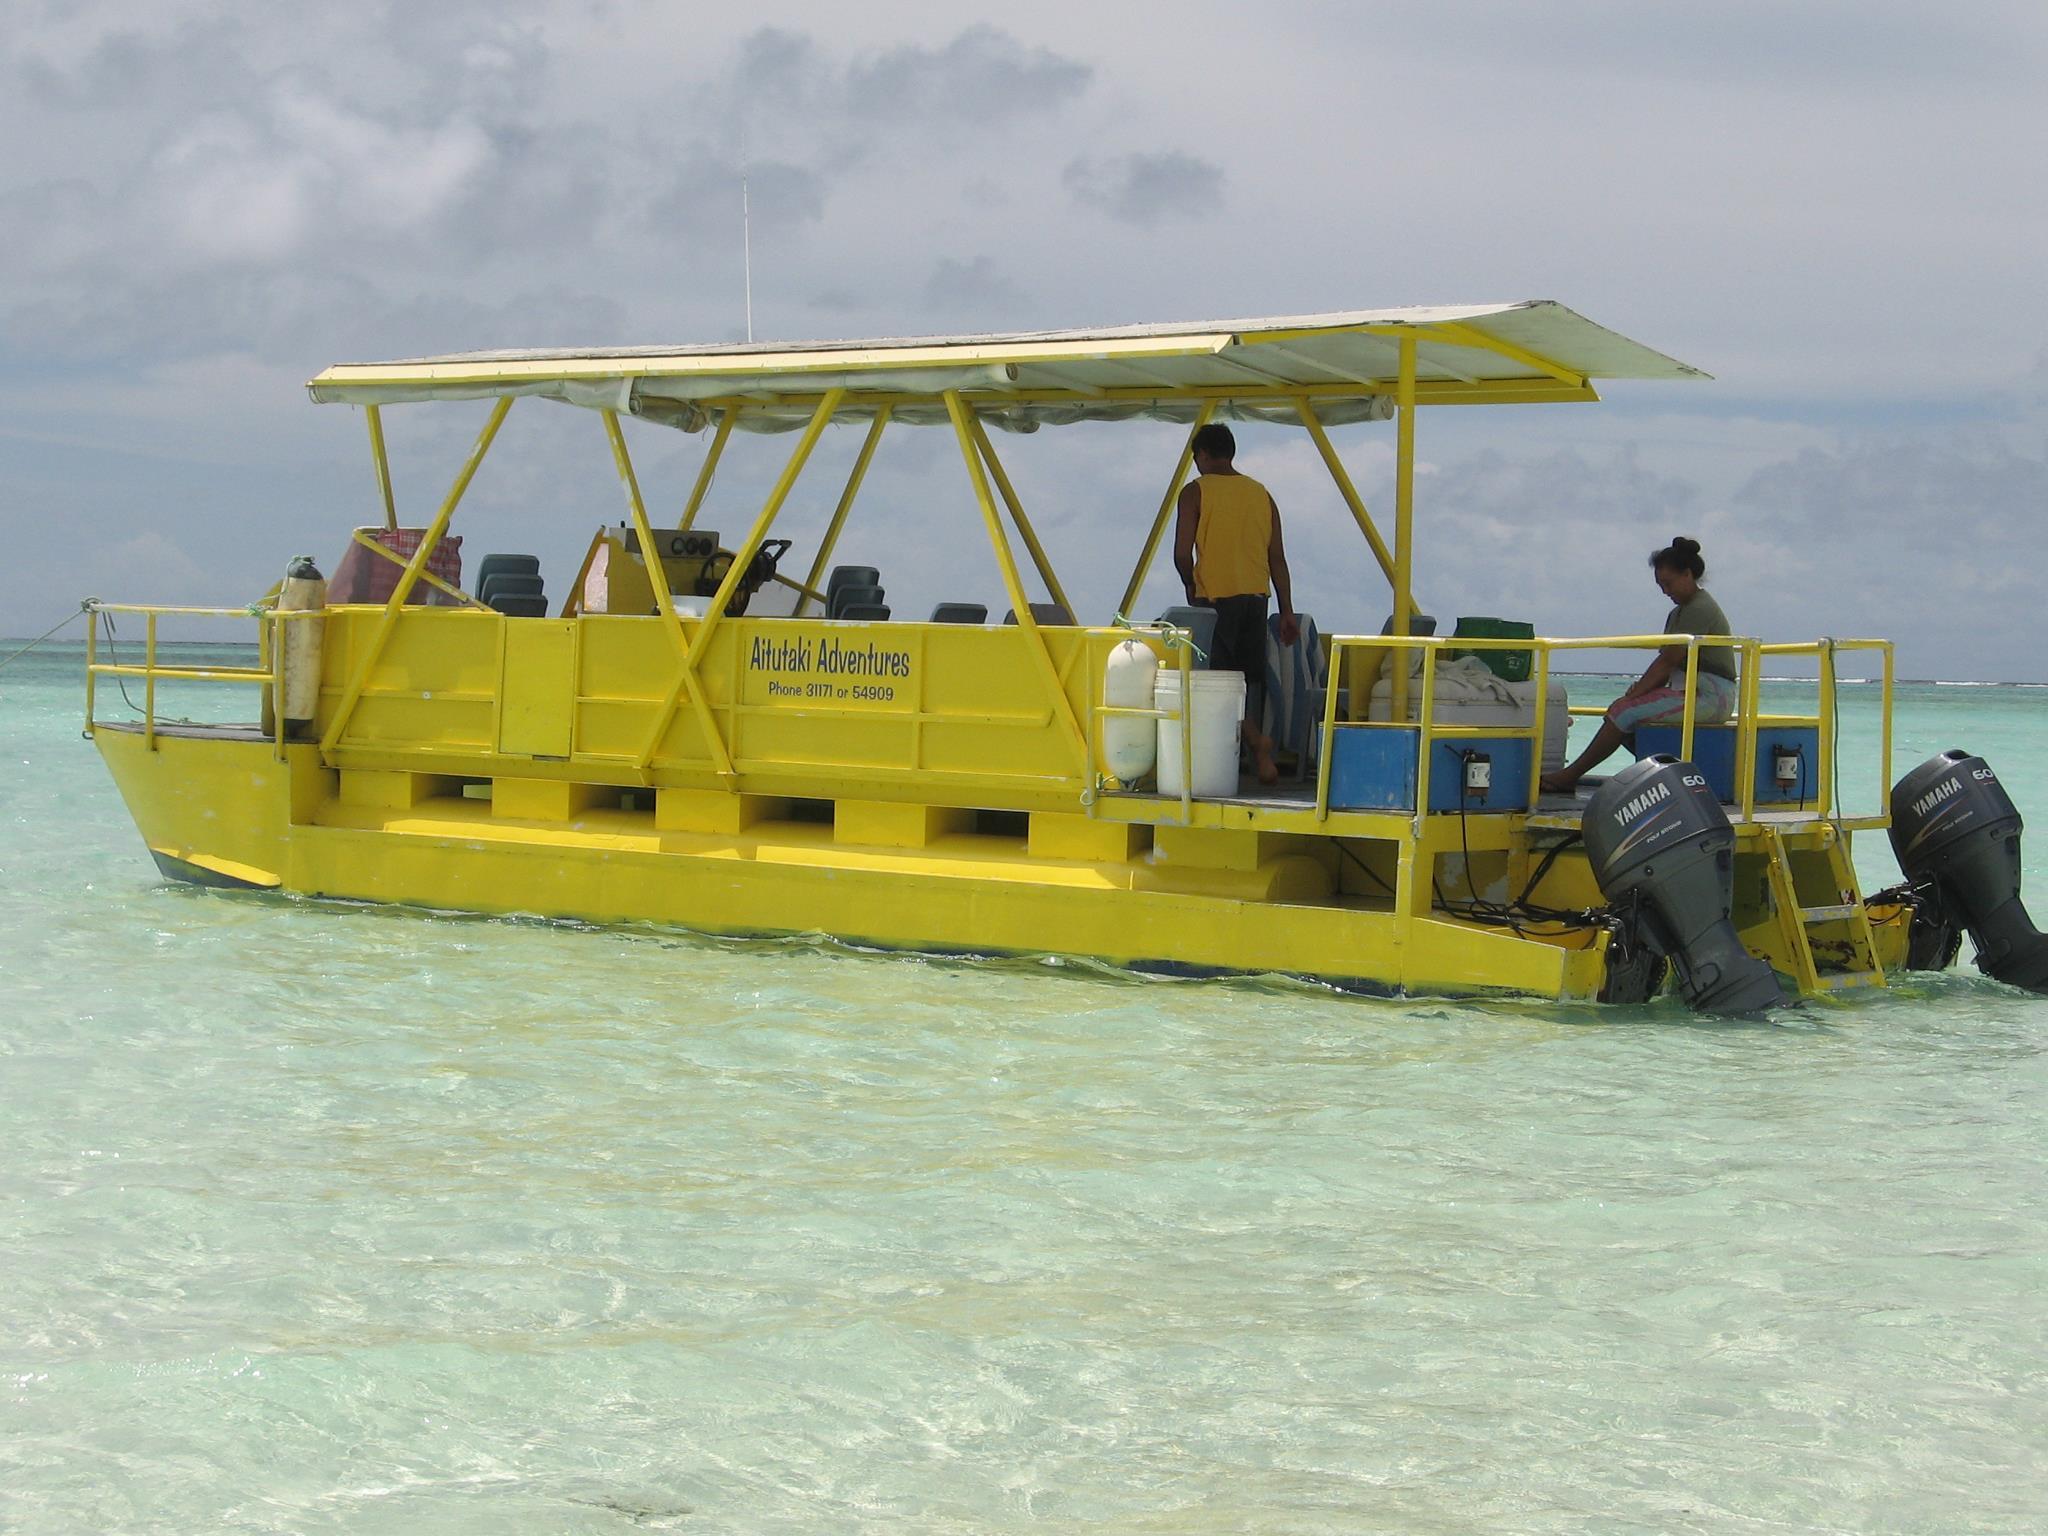 Aitutaki Adventures Tour to the One Foot Island